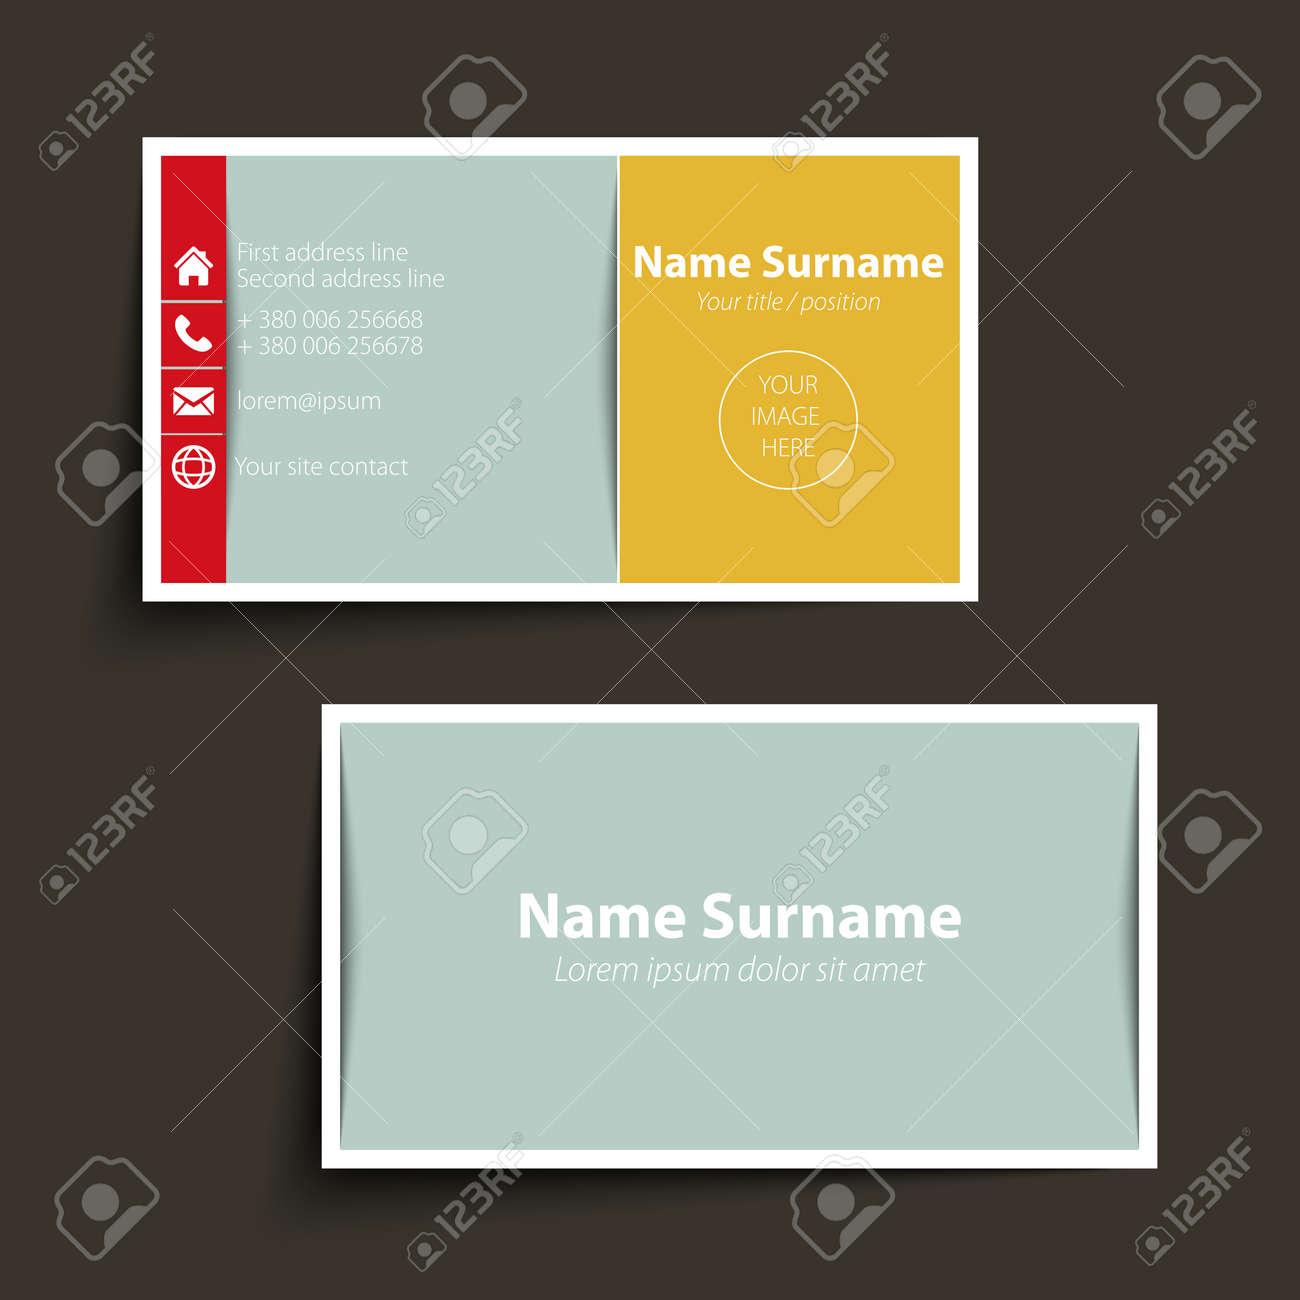 Modern simple business card template vector format royalty free modern simple business card template vector format stock vector 31276591 colourmoves